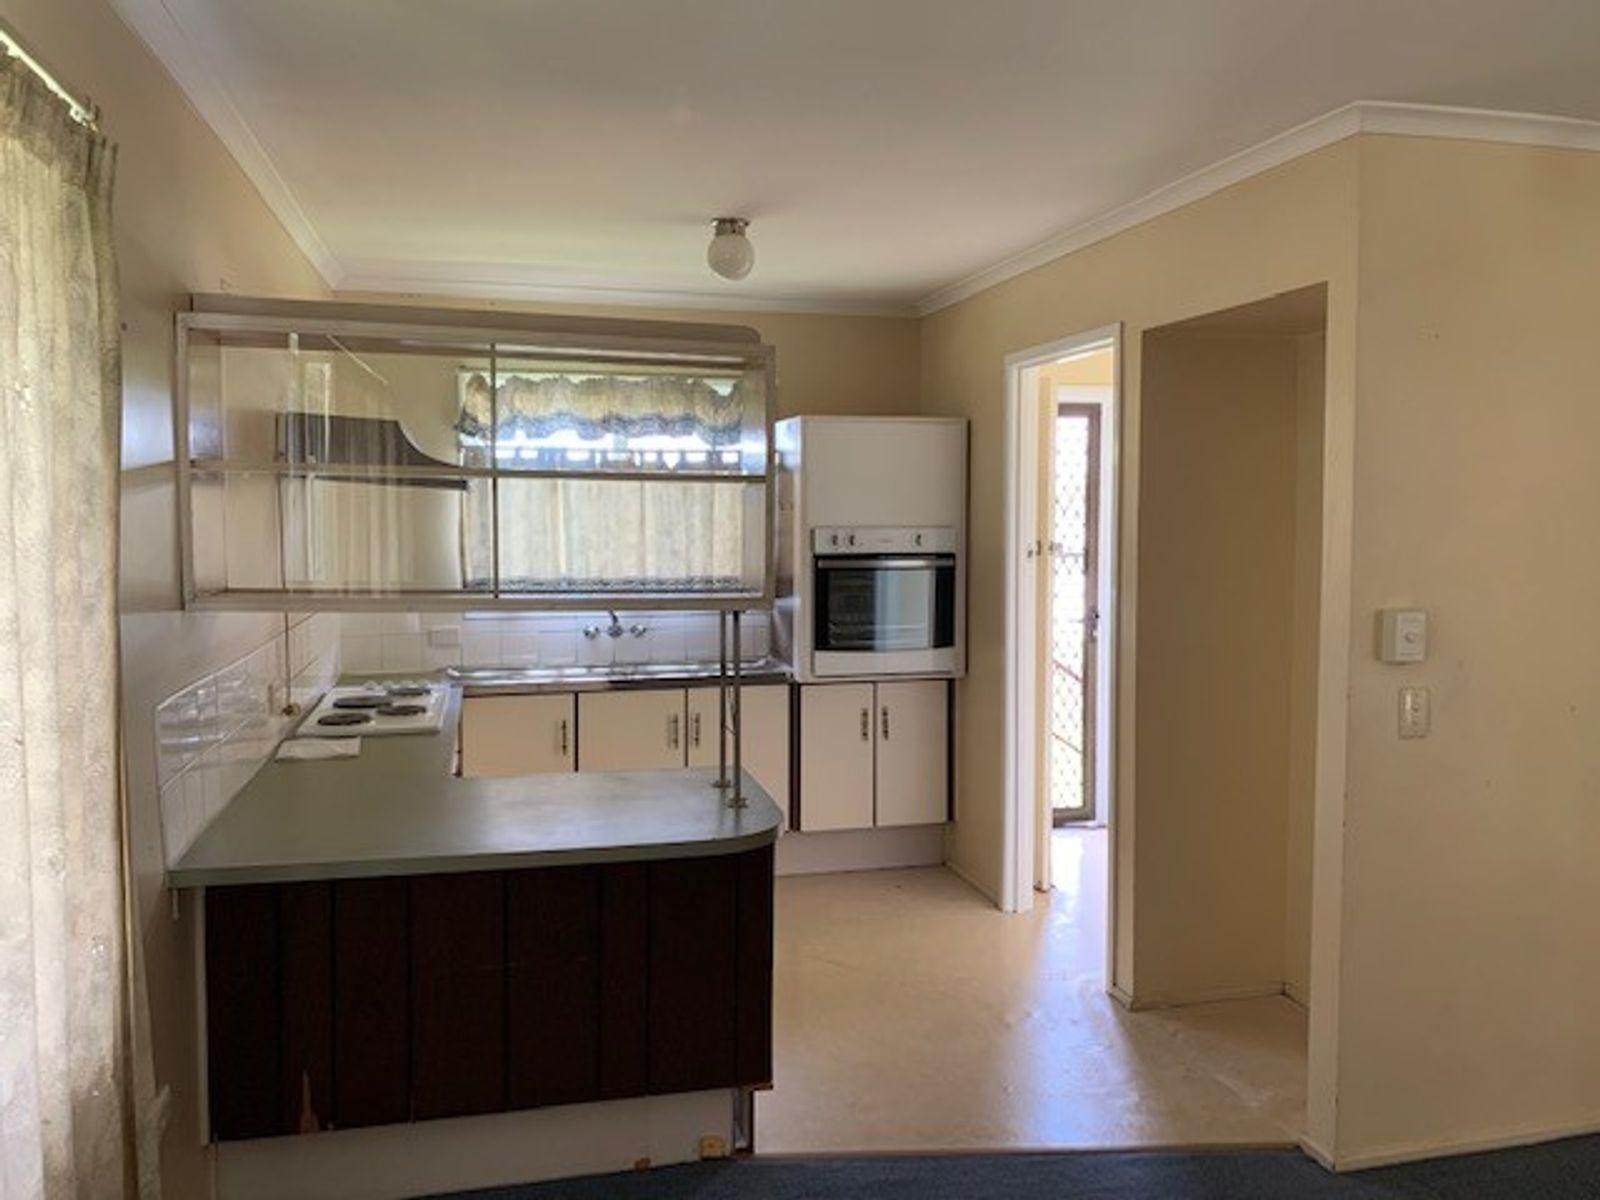 19 Rholanda Crescent, Springwood, QLD 4127